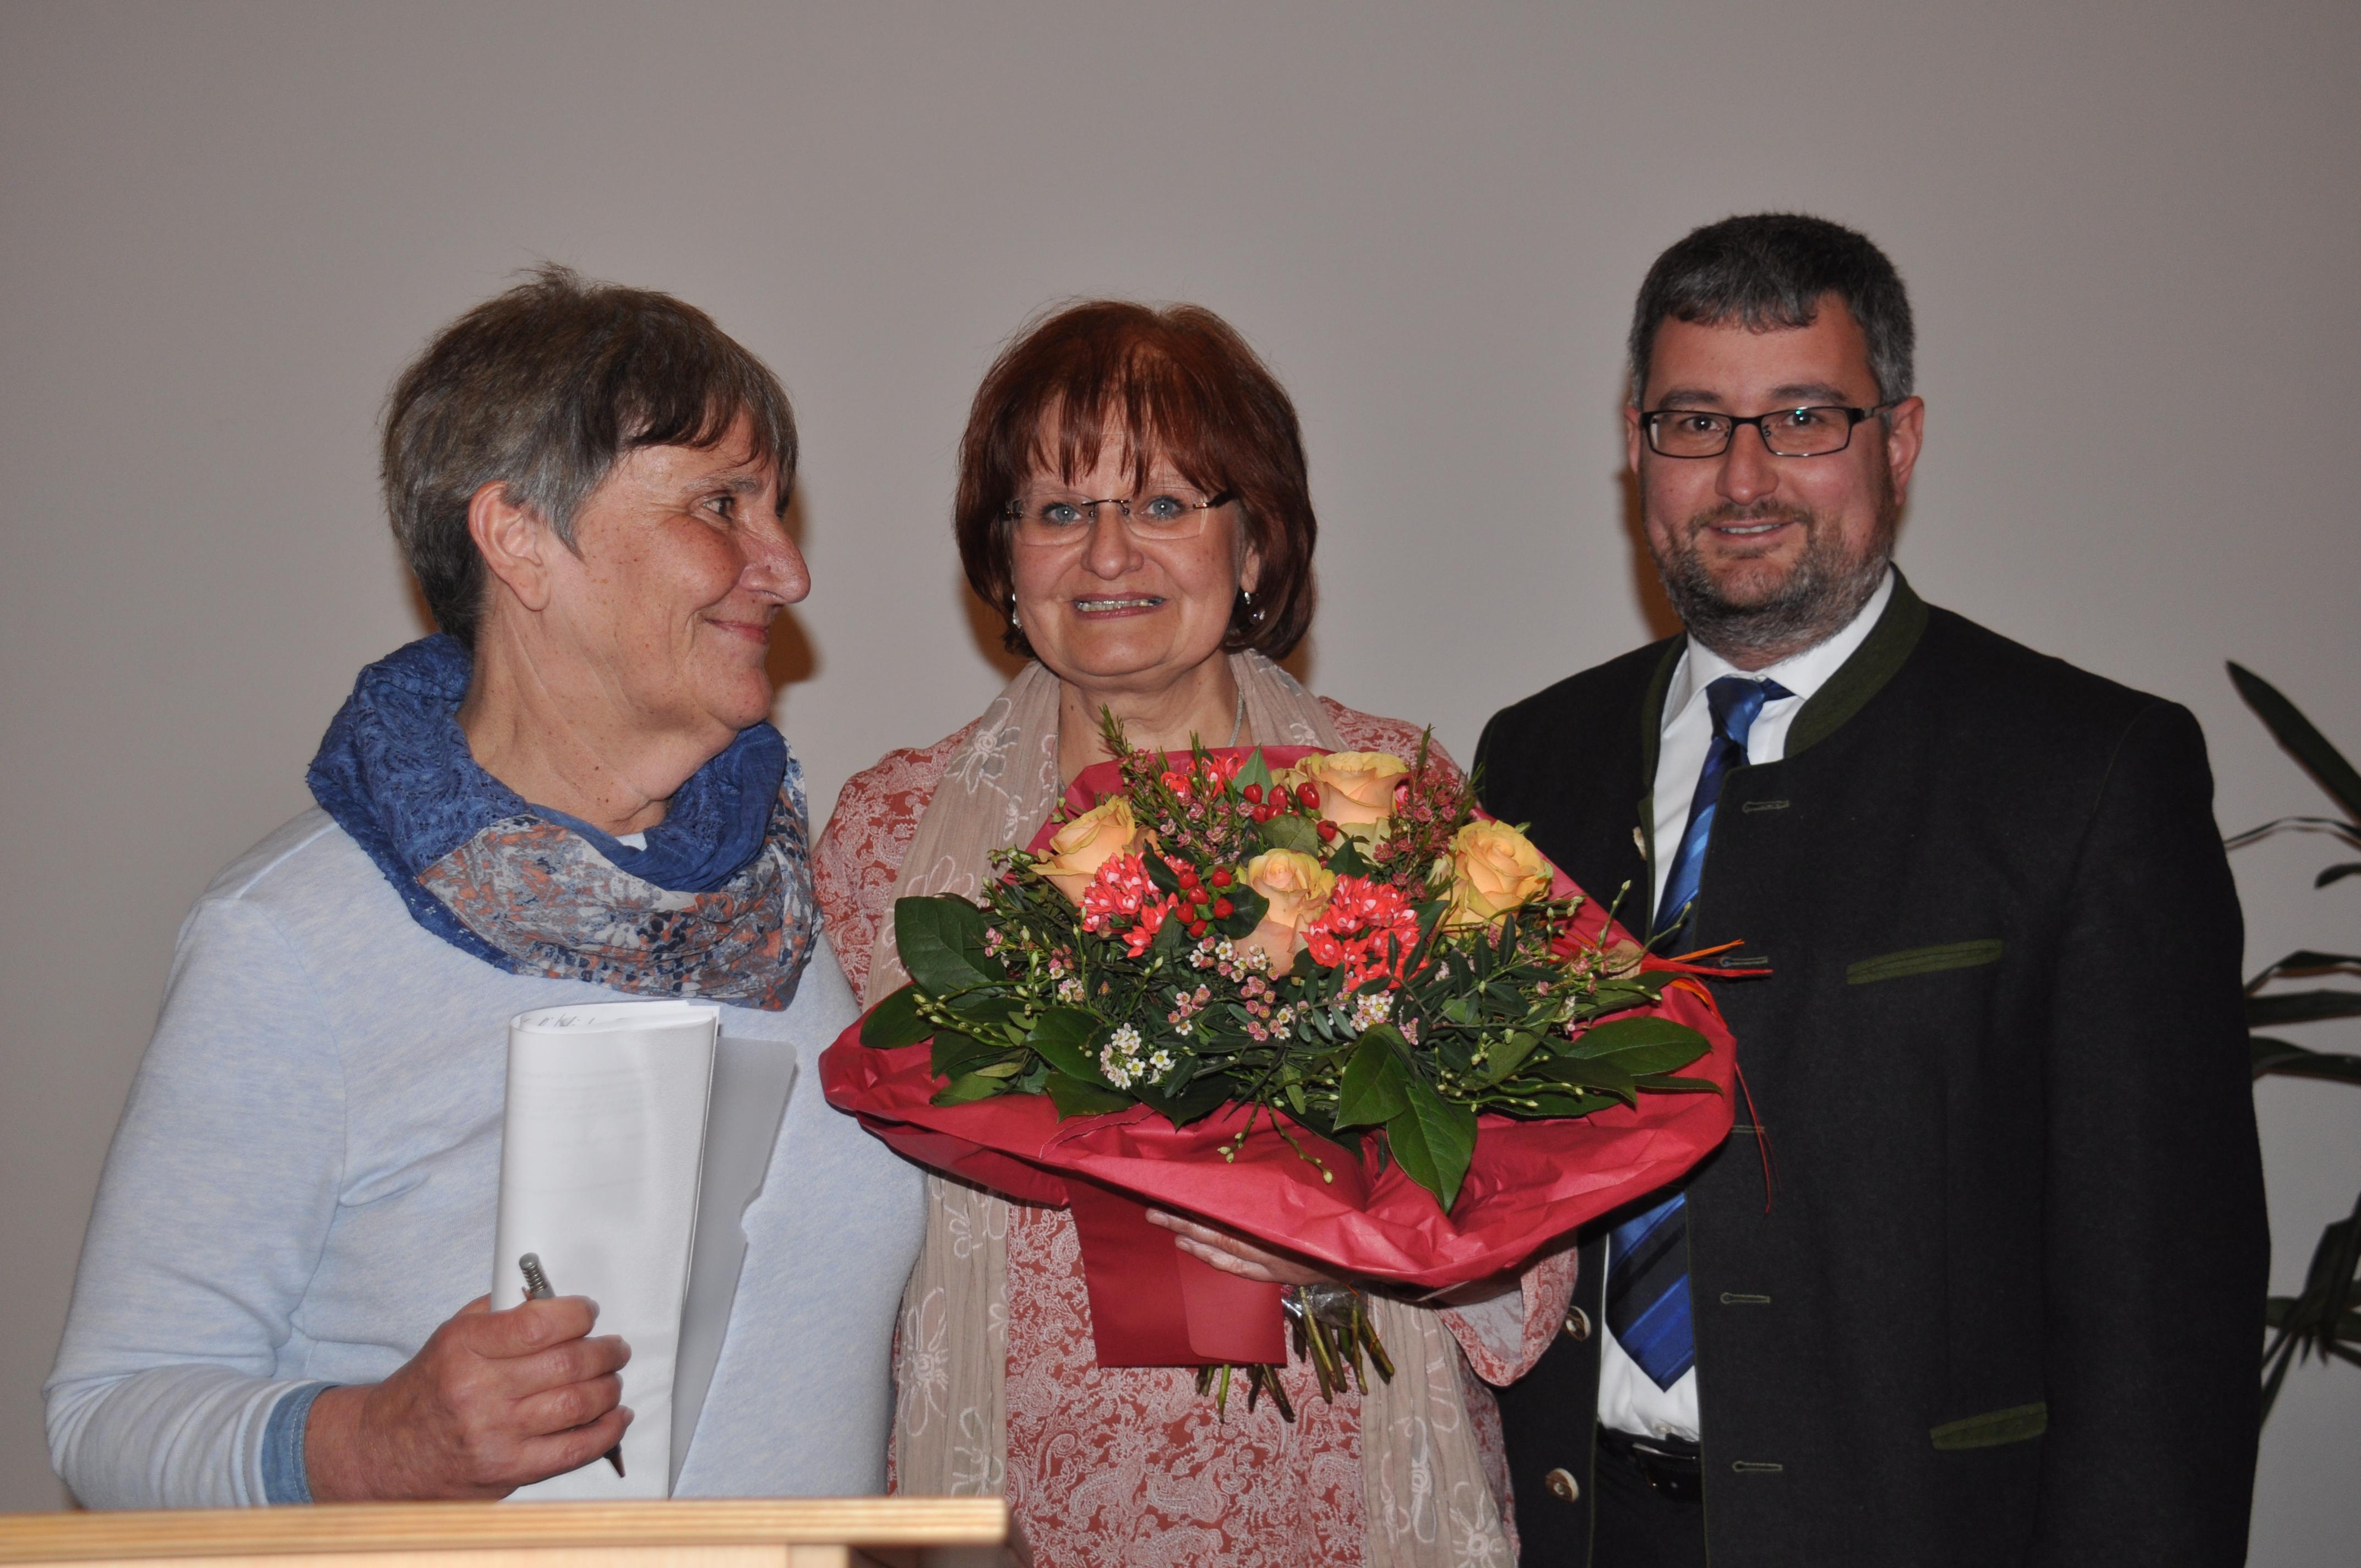 2016-04-19-JHV_CSW_im_Pfrheim_Degerndf.-Foto_Johann_Weiß_020